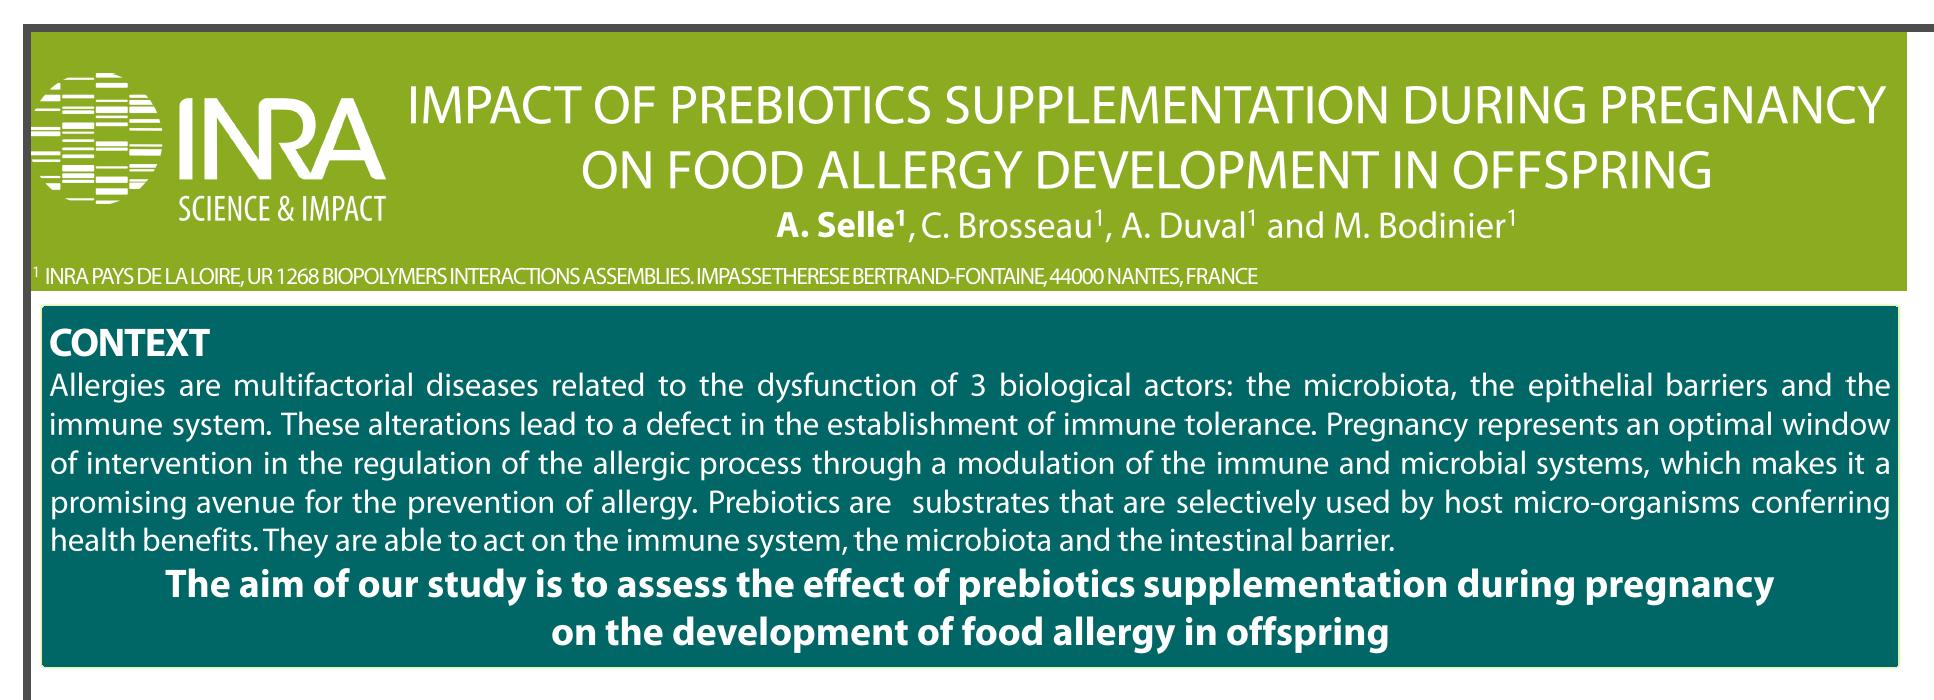 Impact of prebiotics supplementation during pregnancy on food allergy development in offspring